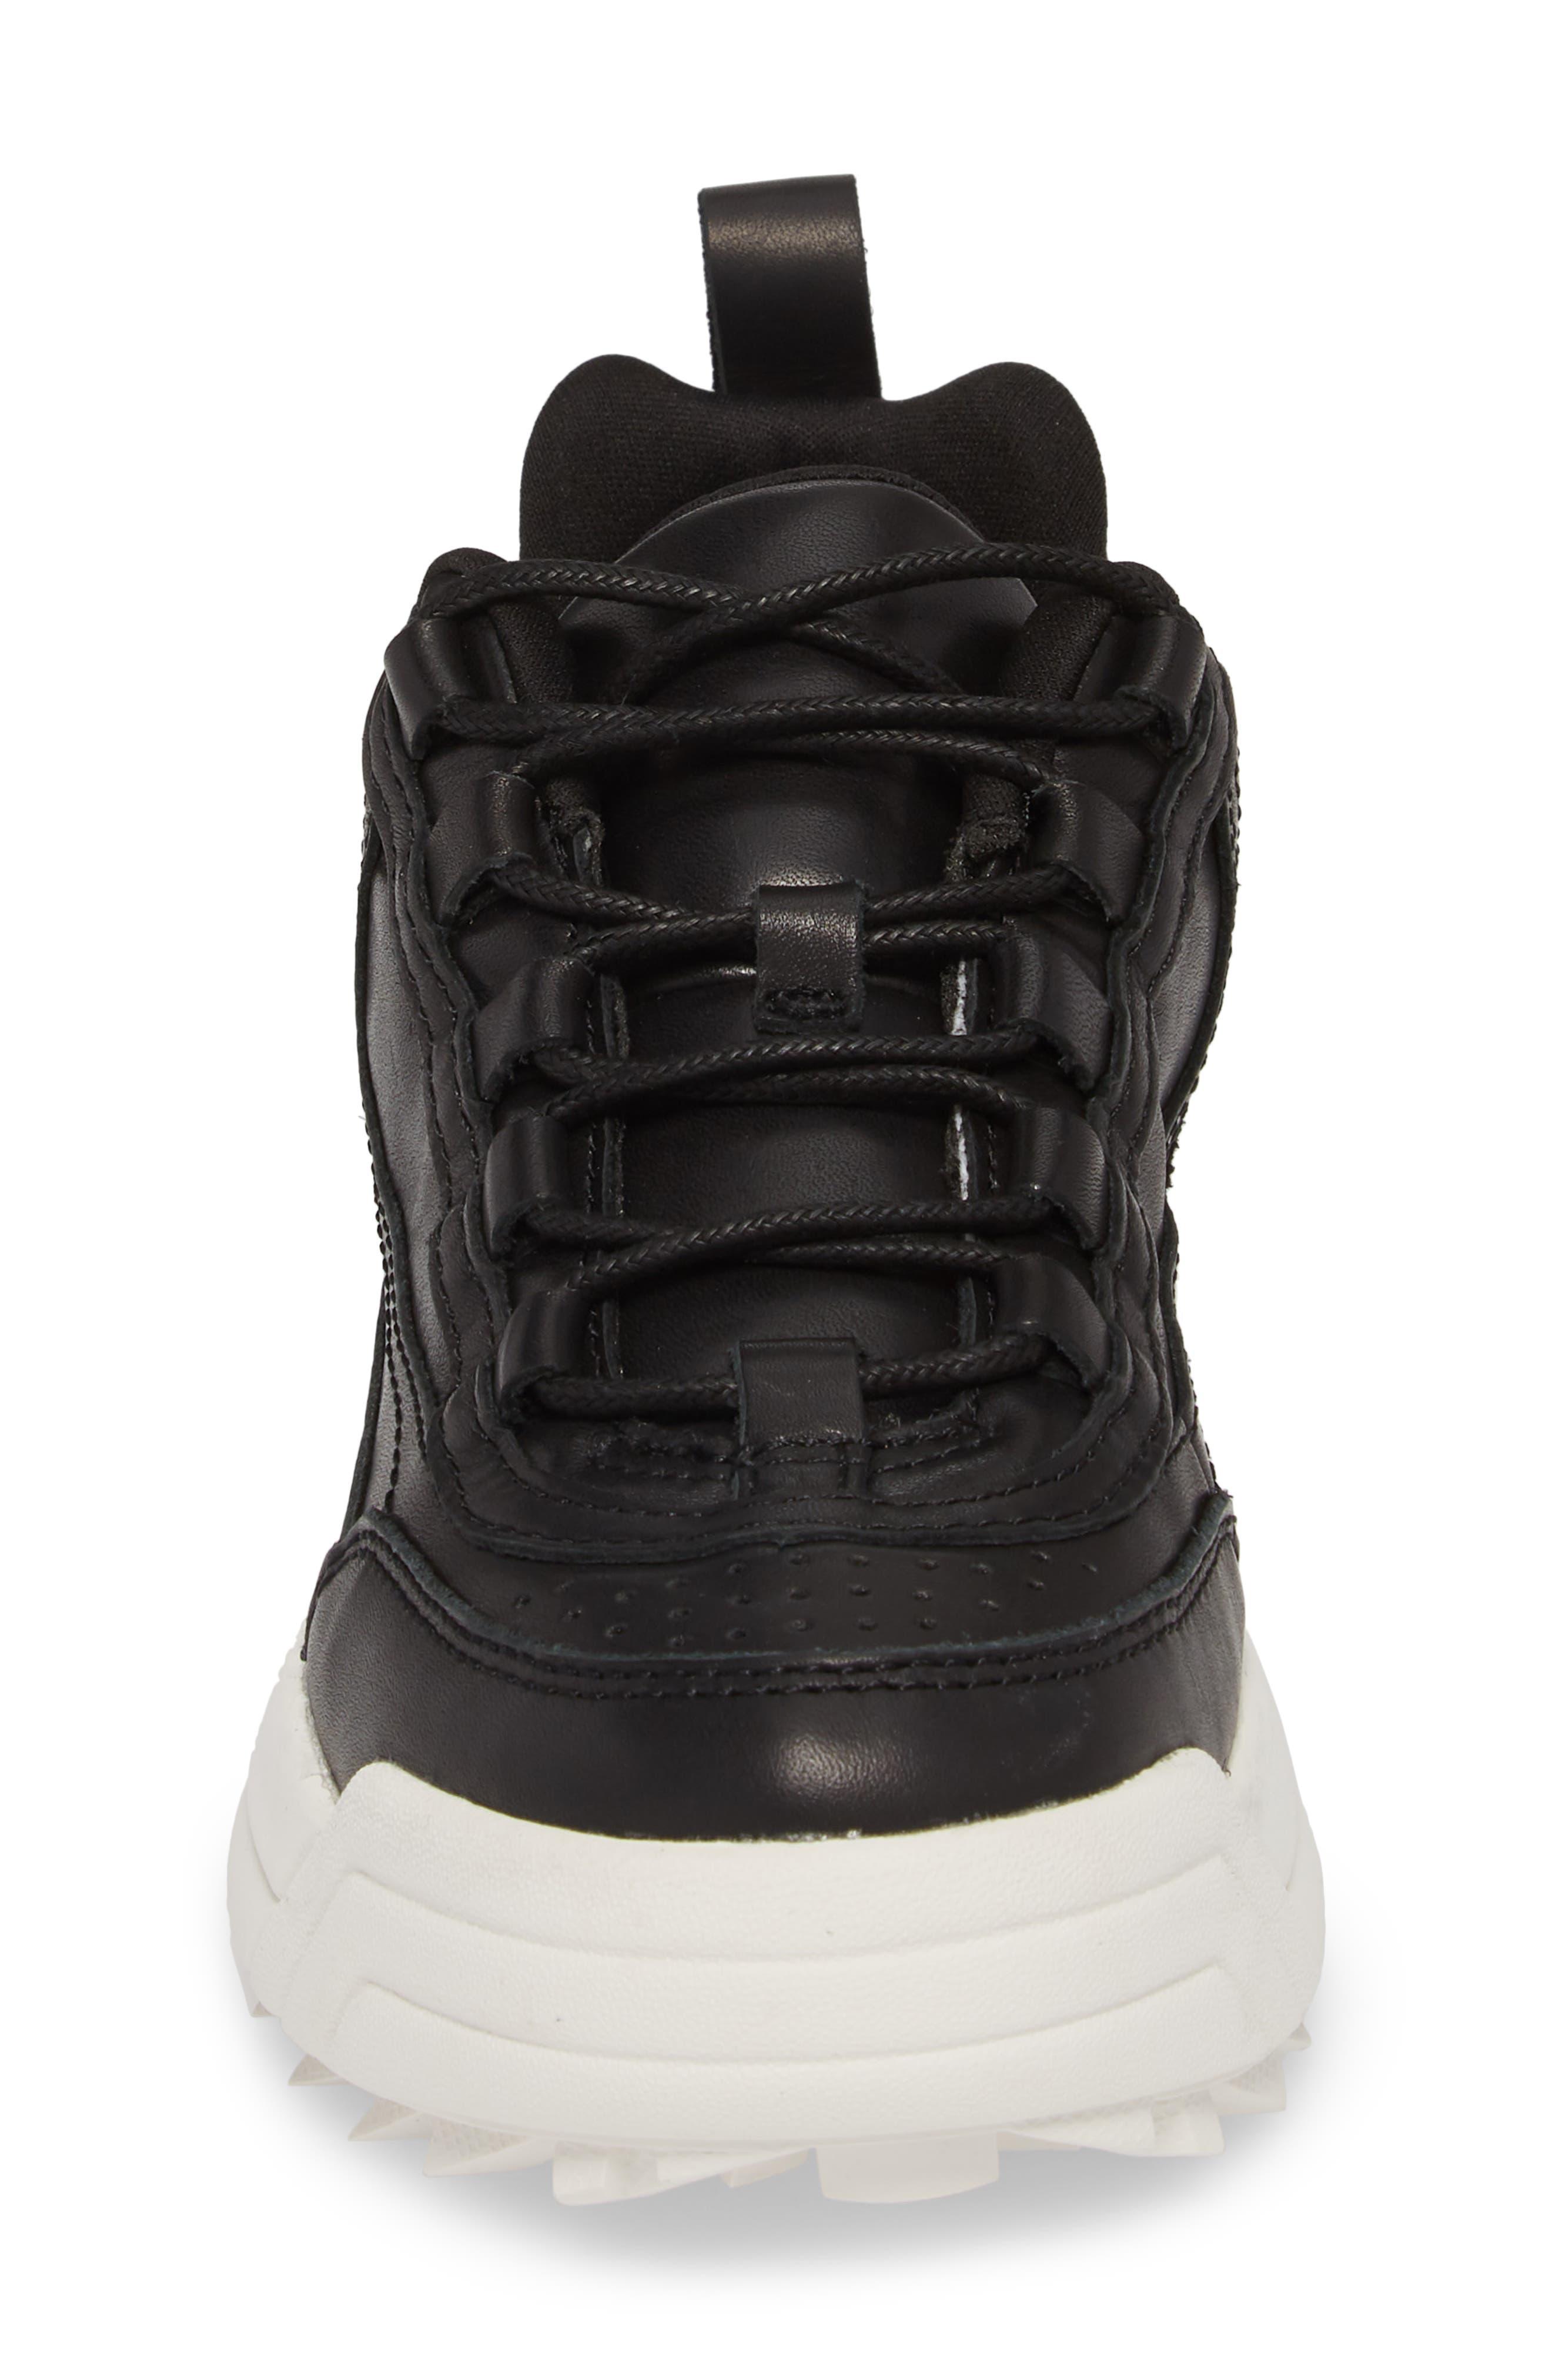 Sidekick Platform Sneaker,                             Alternate thumbnail 4, color,                             Black Leather